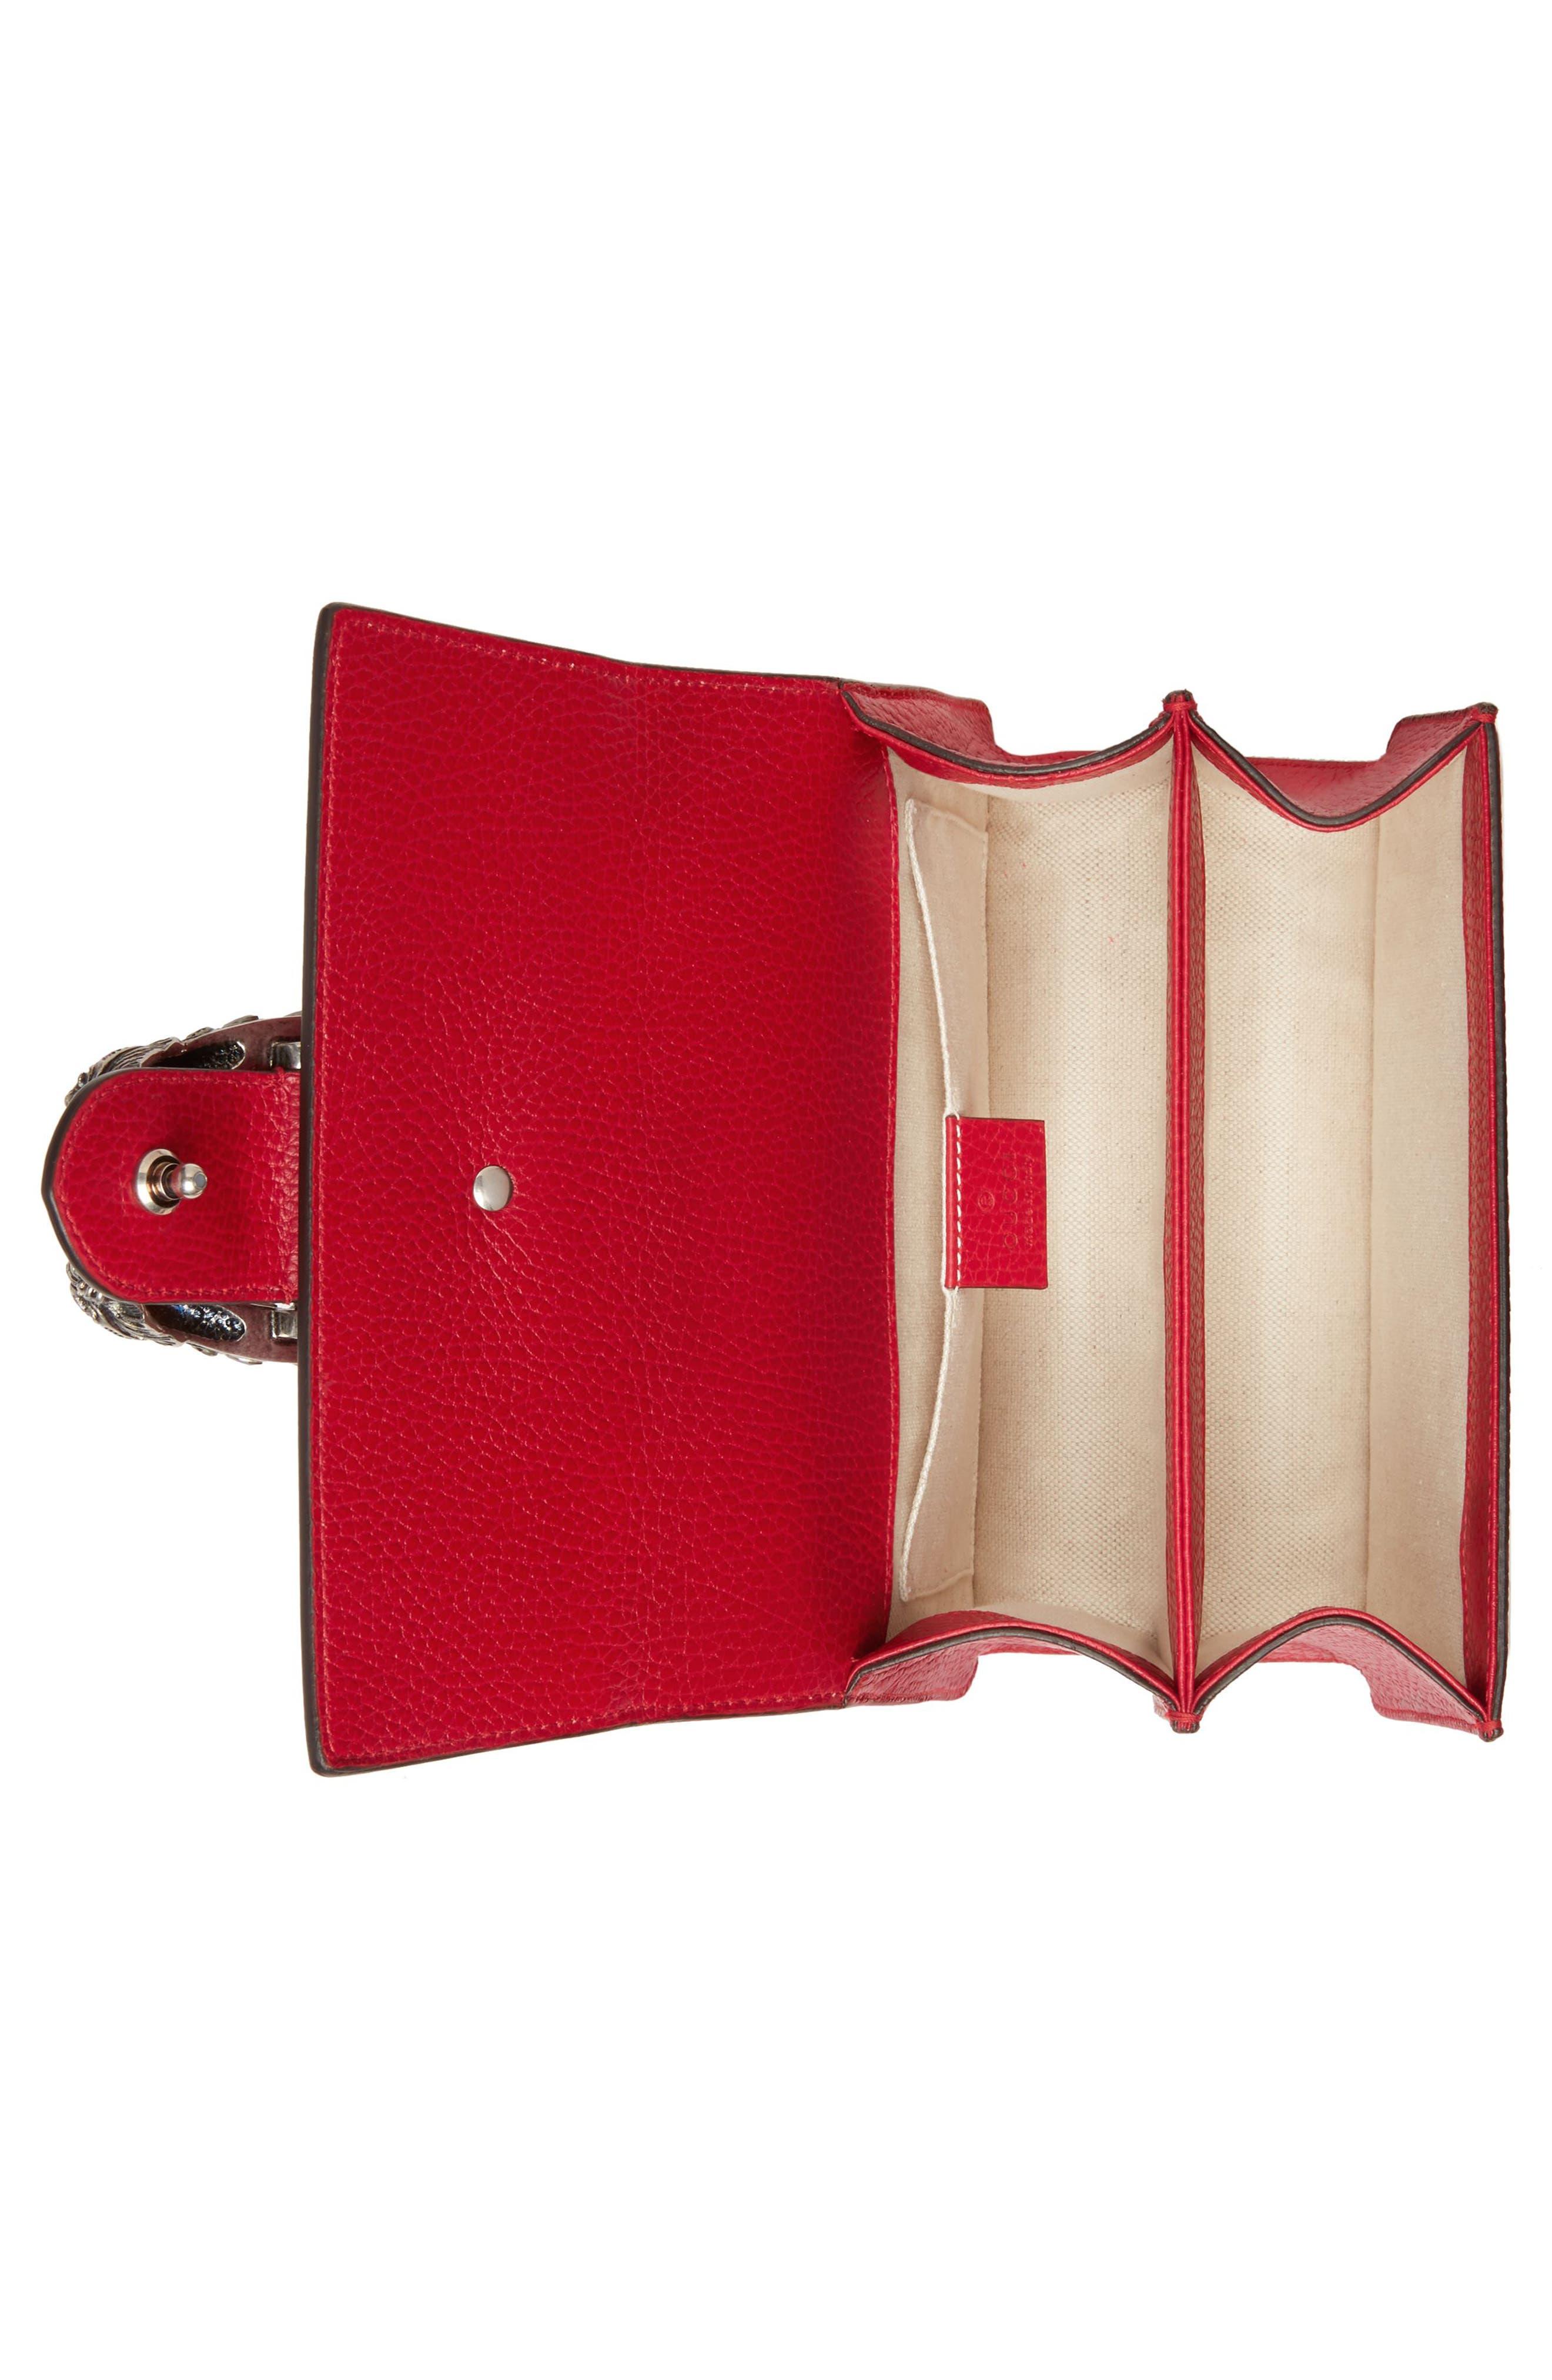 Mini Dionysus Leather Top Handle Satchel,                             Alternate thumbnail 3, color,                             Red/ Blue/ Black Diamond